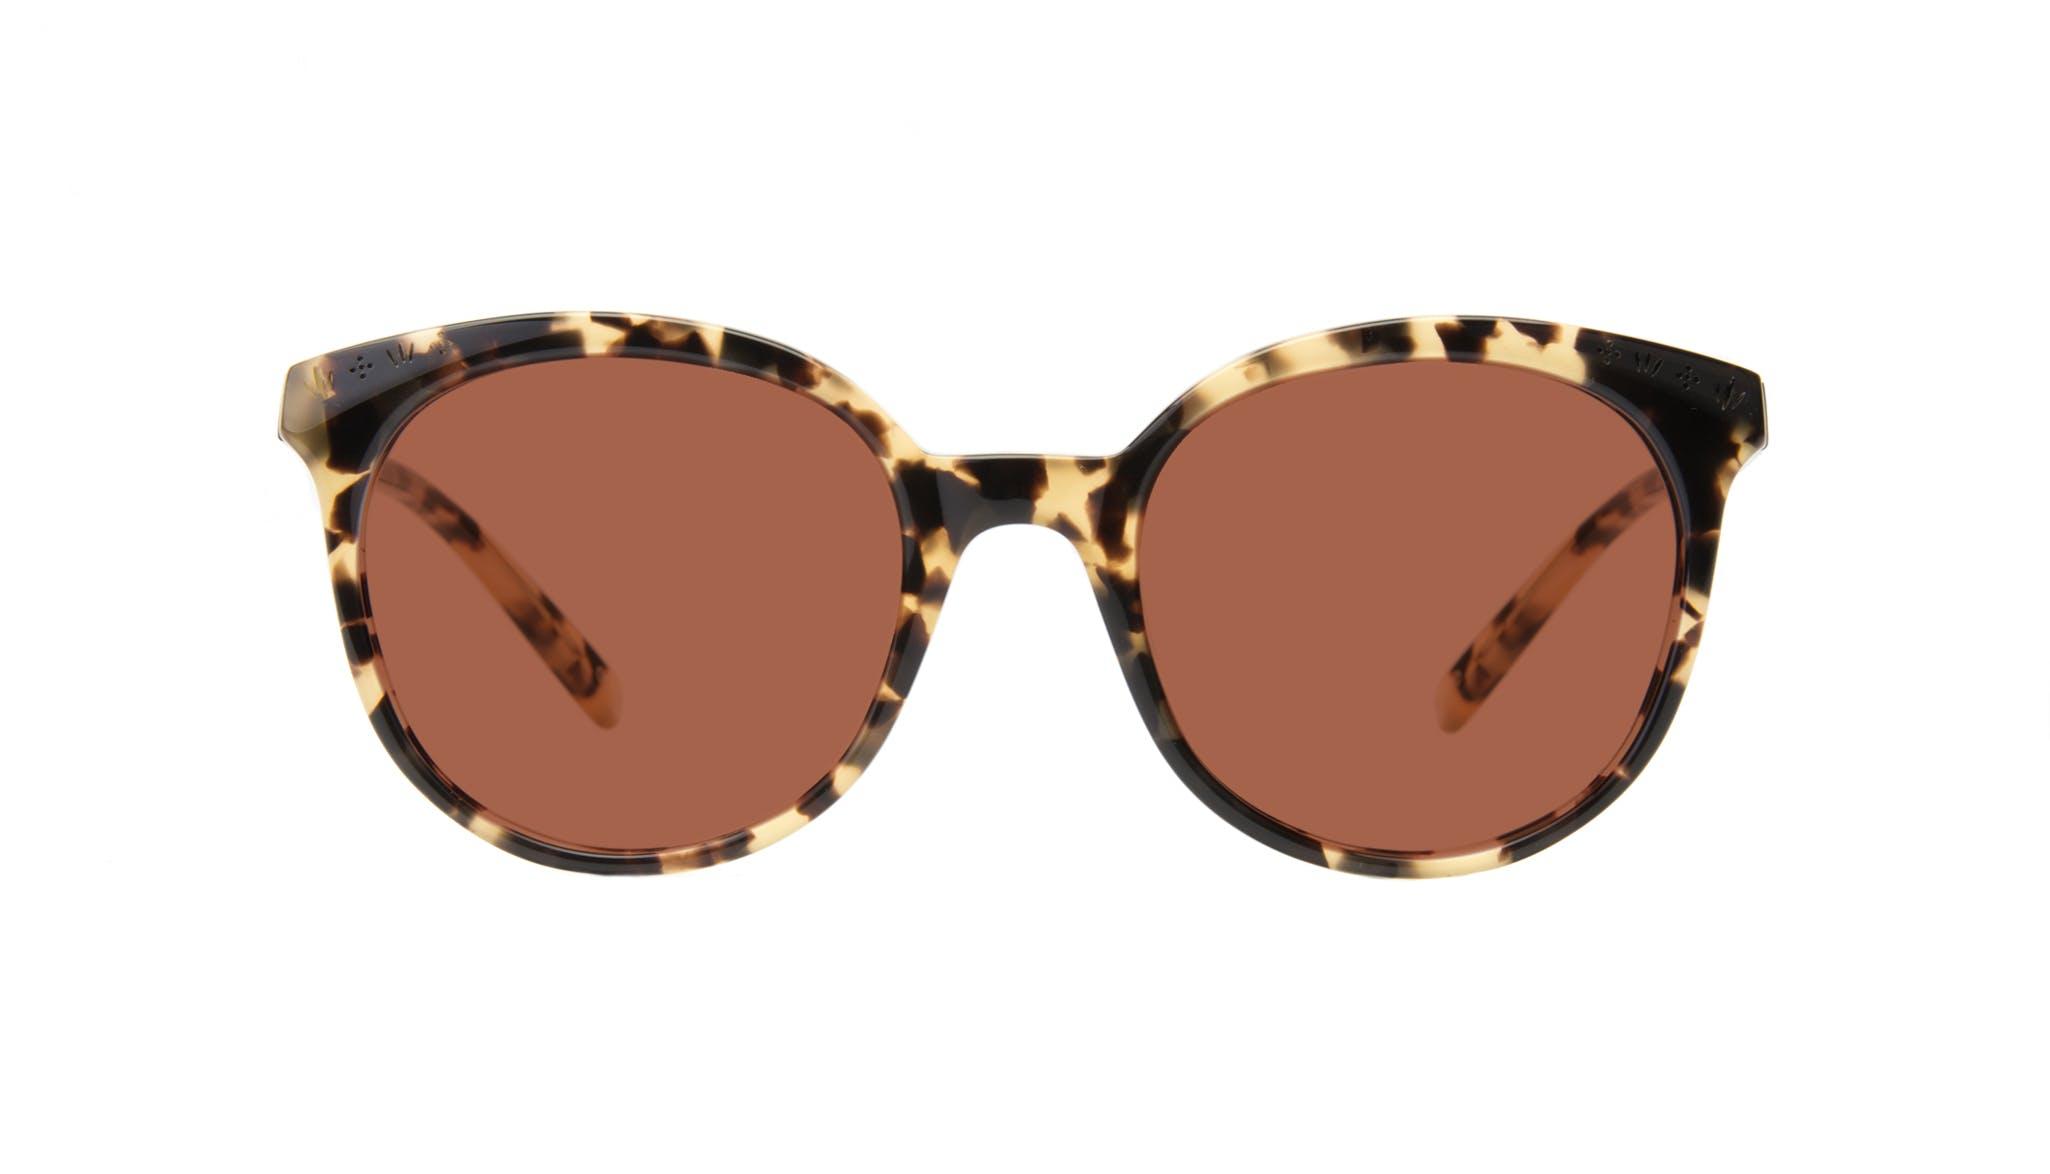 Affordable Fashion Glasses Round Sunglasses Women Must Tortoise